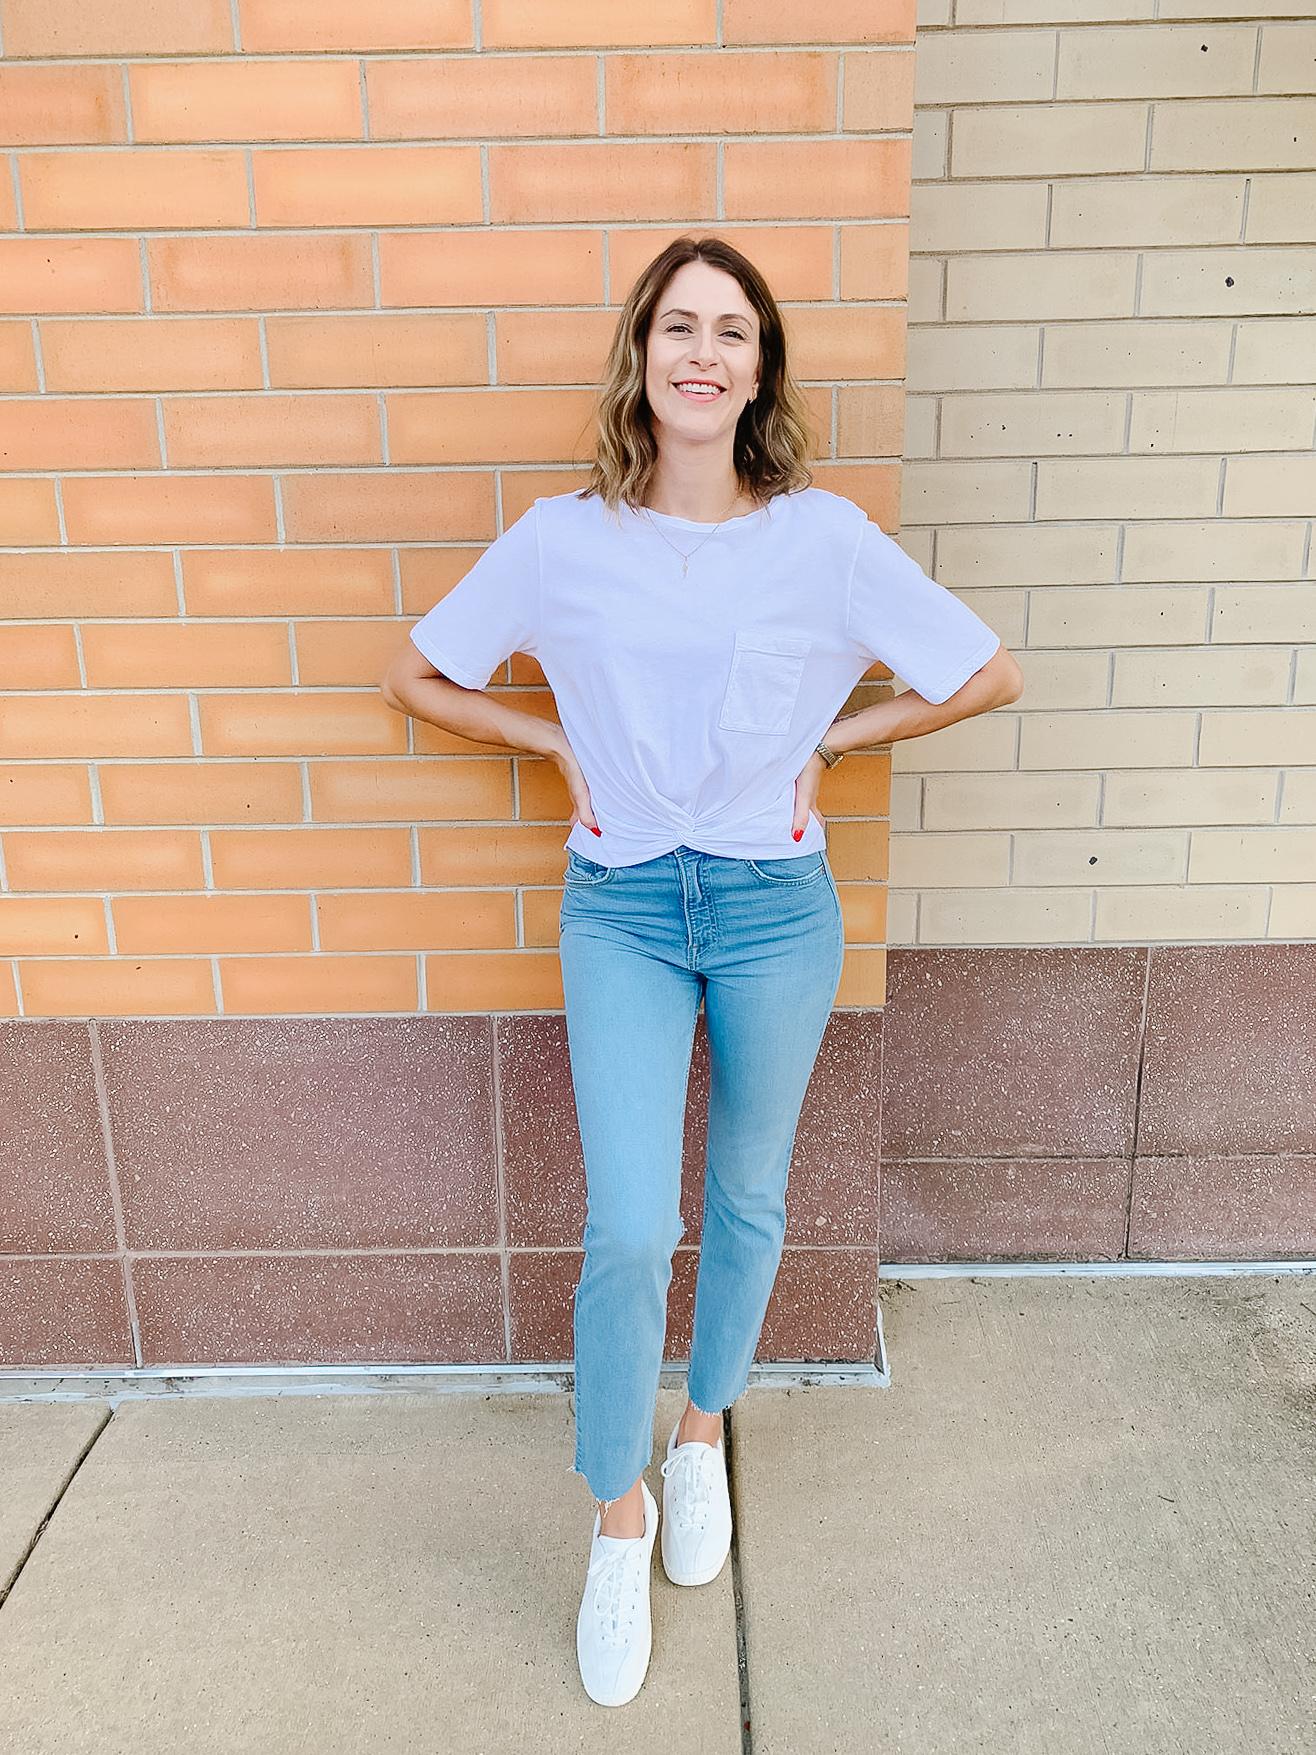 LA Made - Tana Twist Pocket Tee@ $54 GRLFRND - Reed Holding On High Rise Slim Jeans@ $224